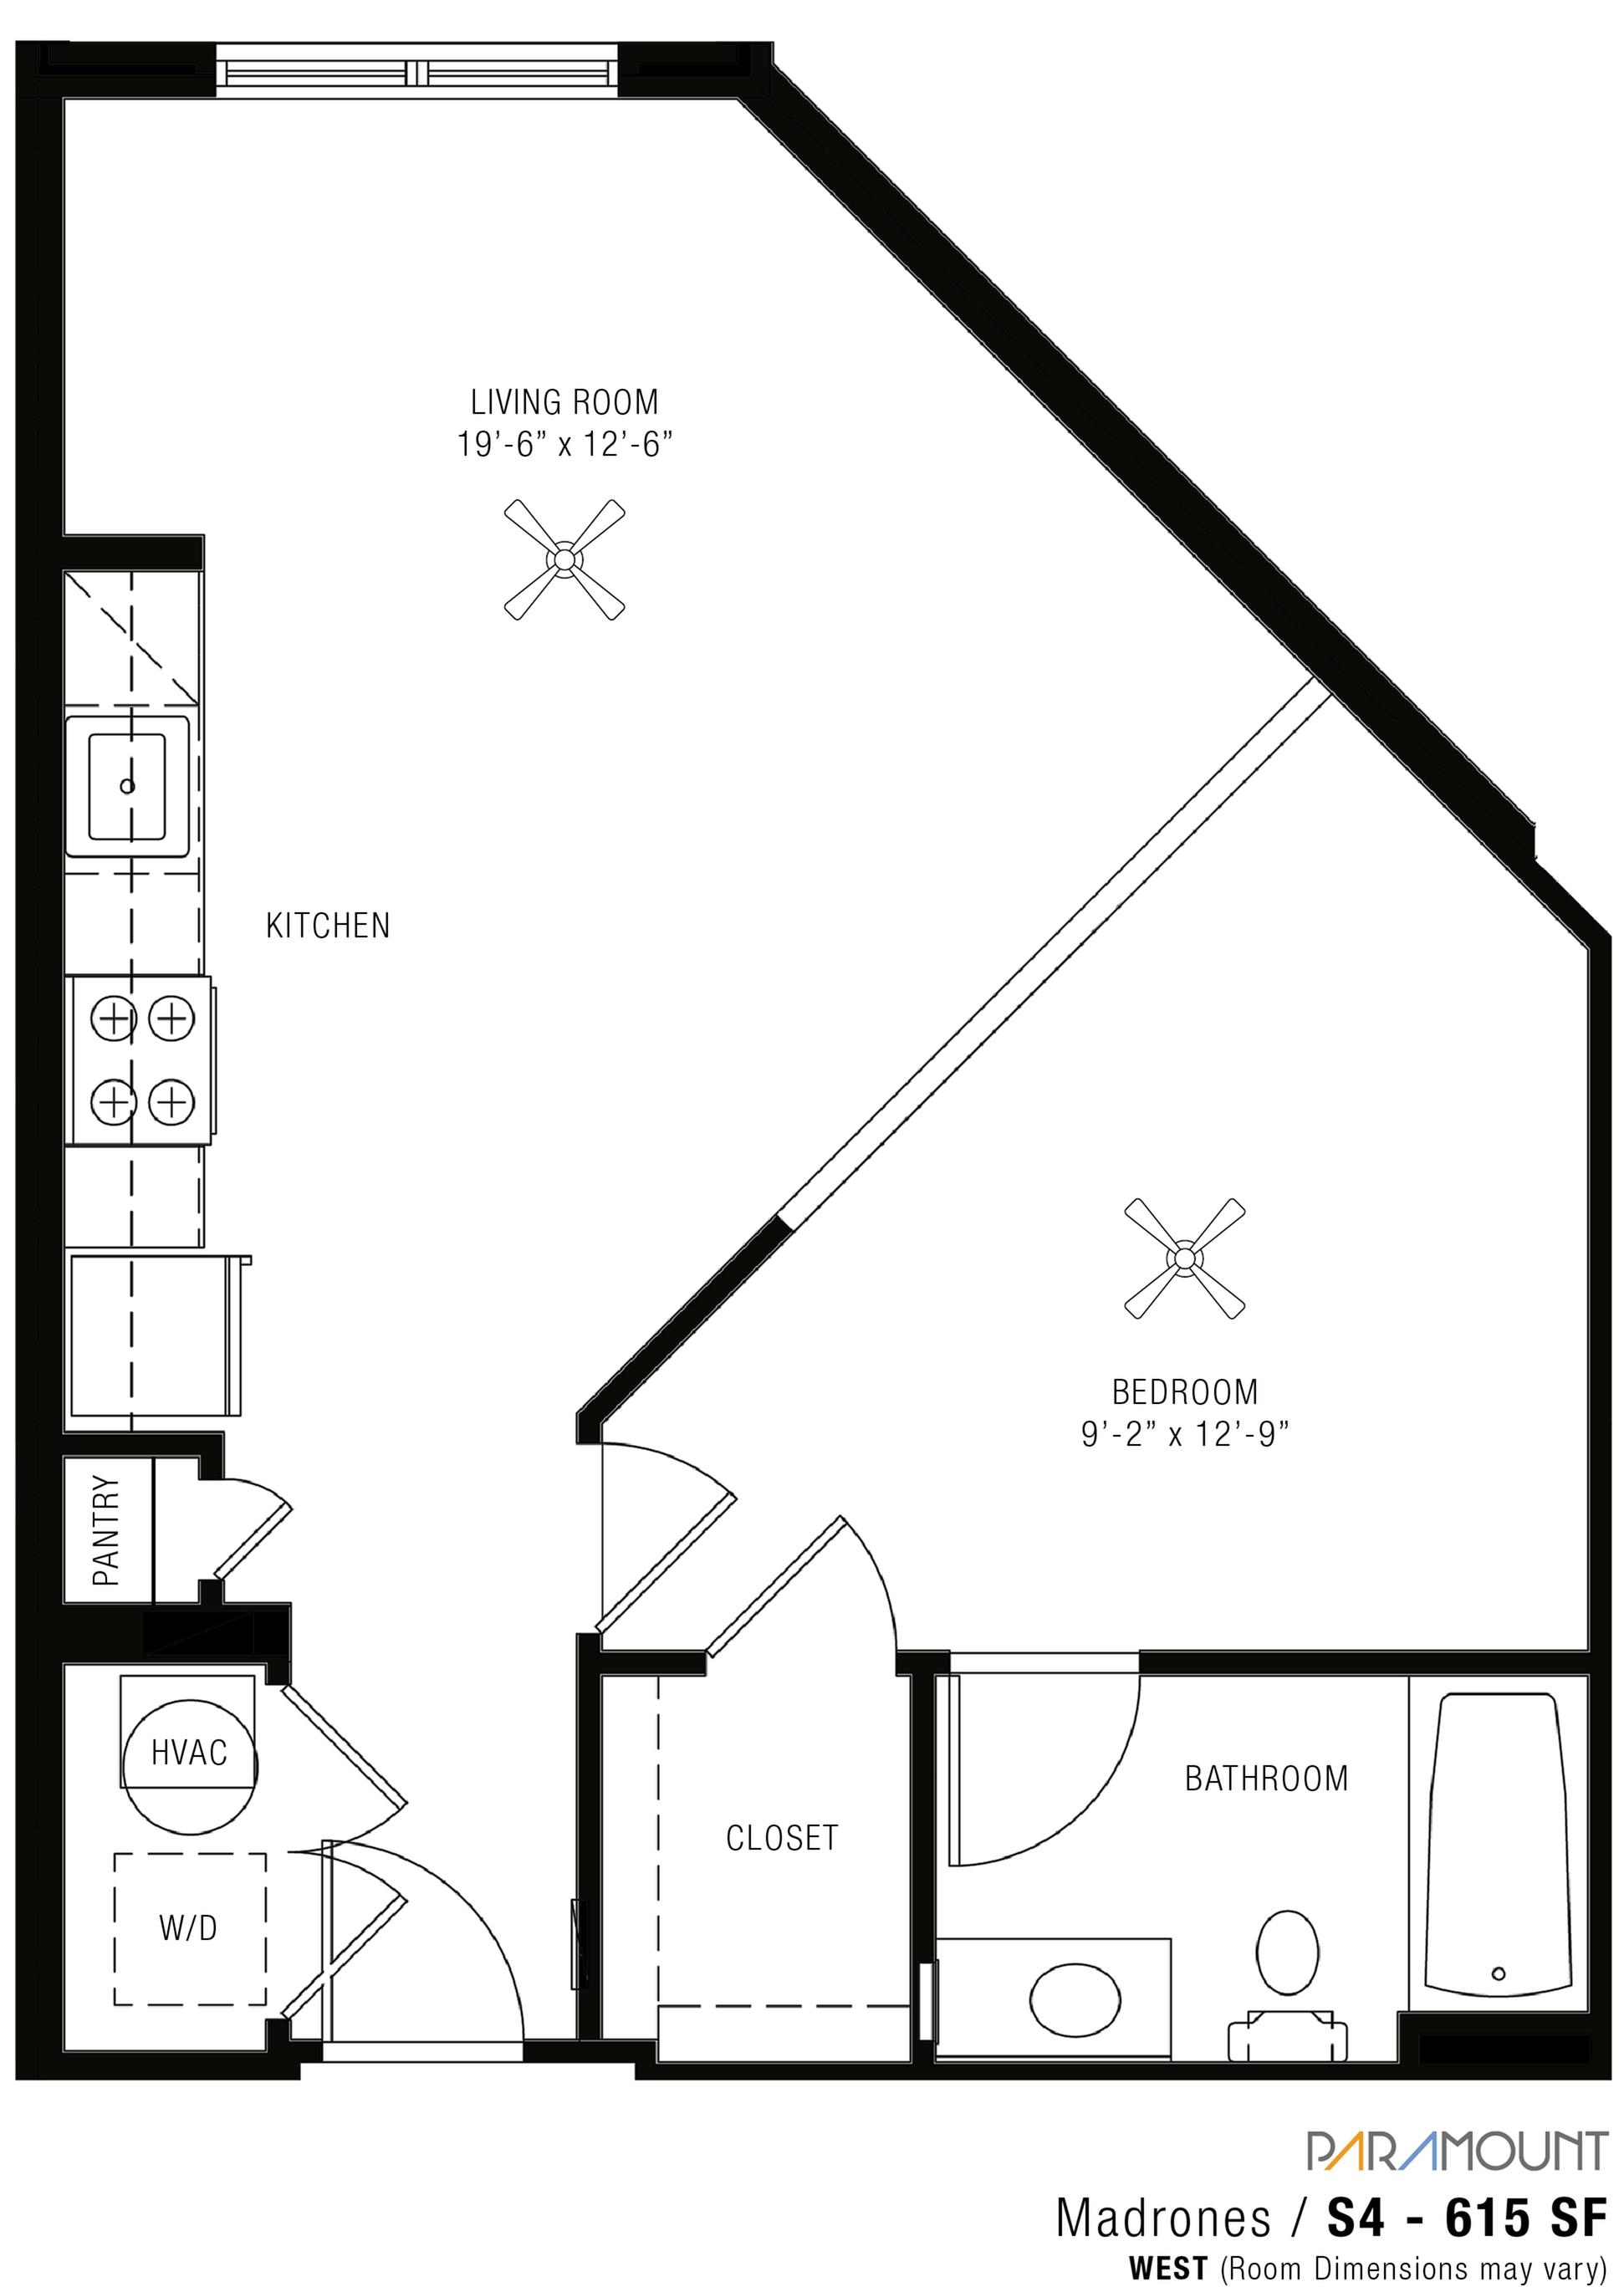 Spacious Floor Plans at Paramount